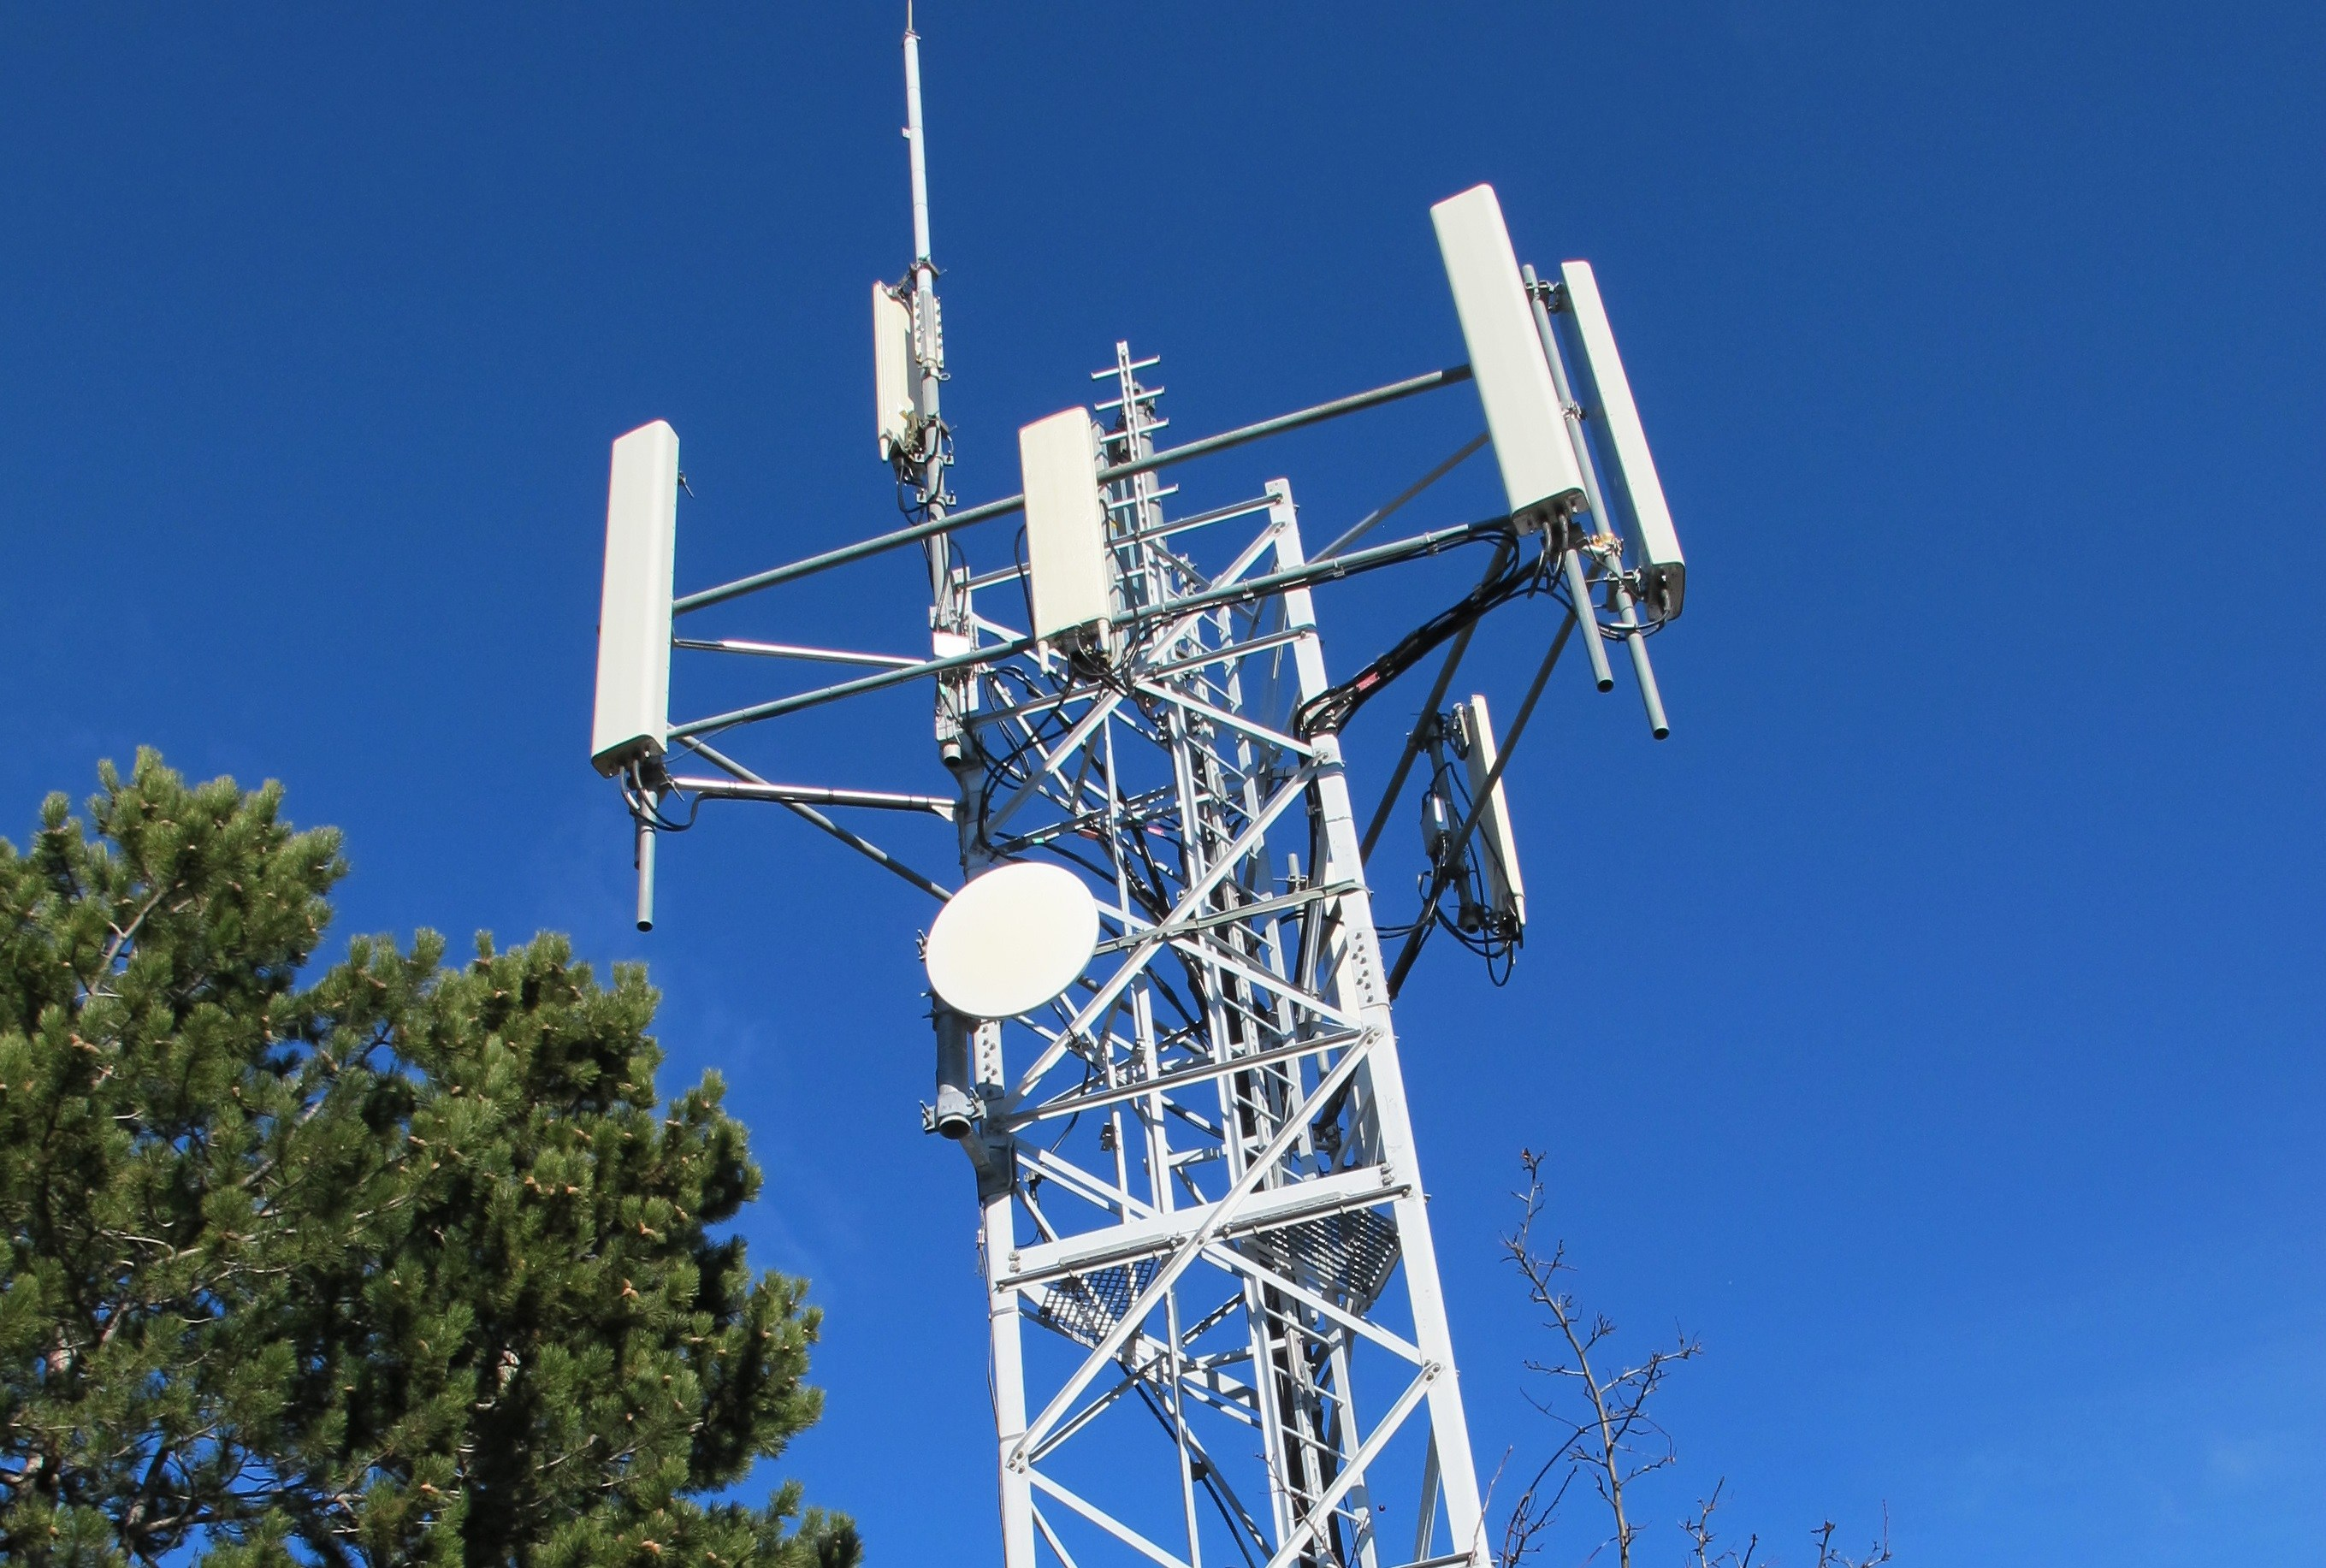 Free Mobile installe sa première antenne 5G